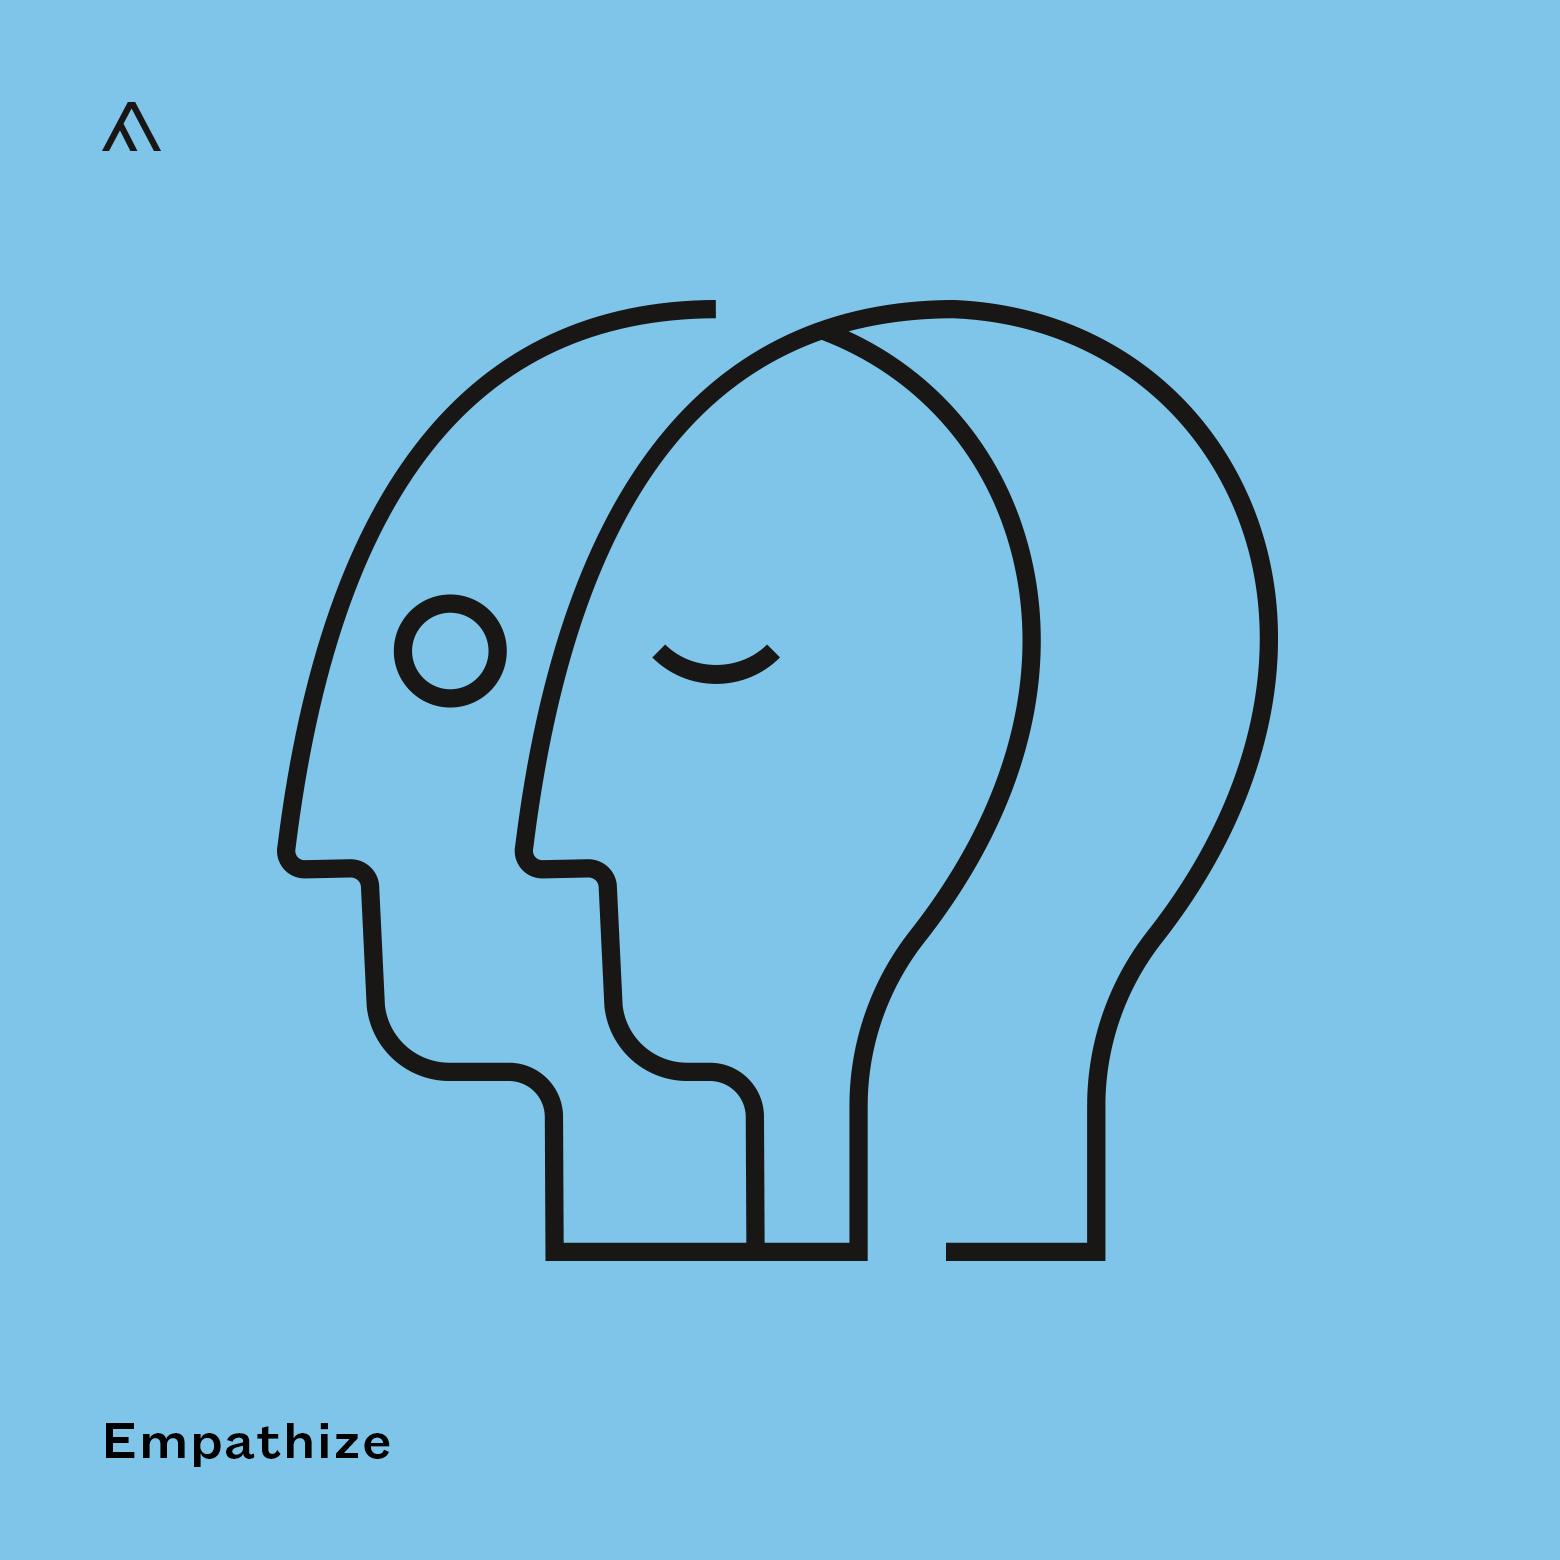 asx-corporatedesign-buero-ink-empathize